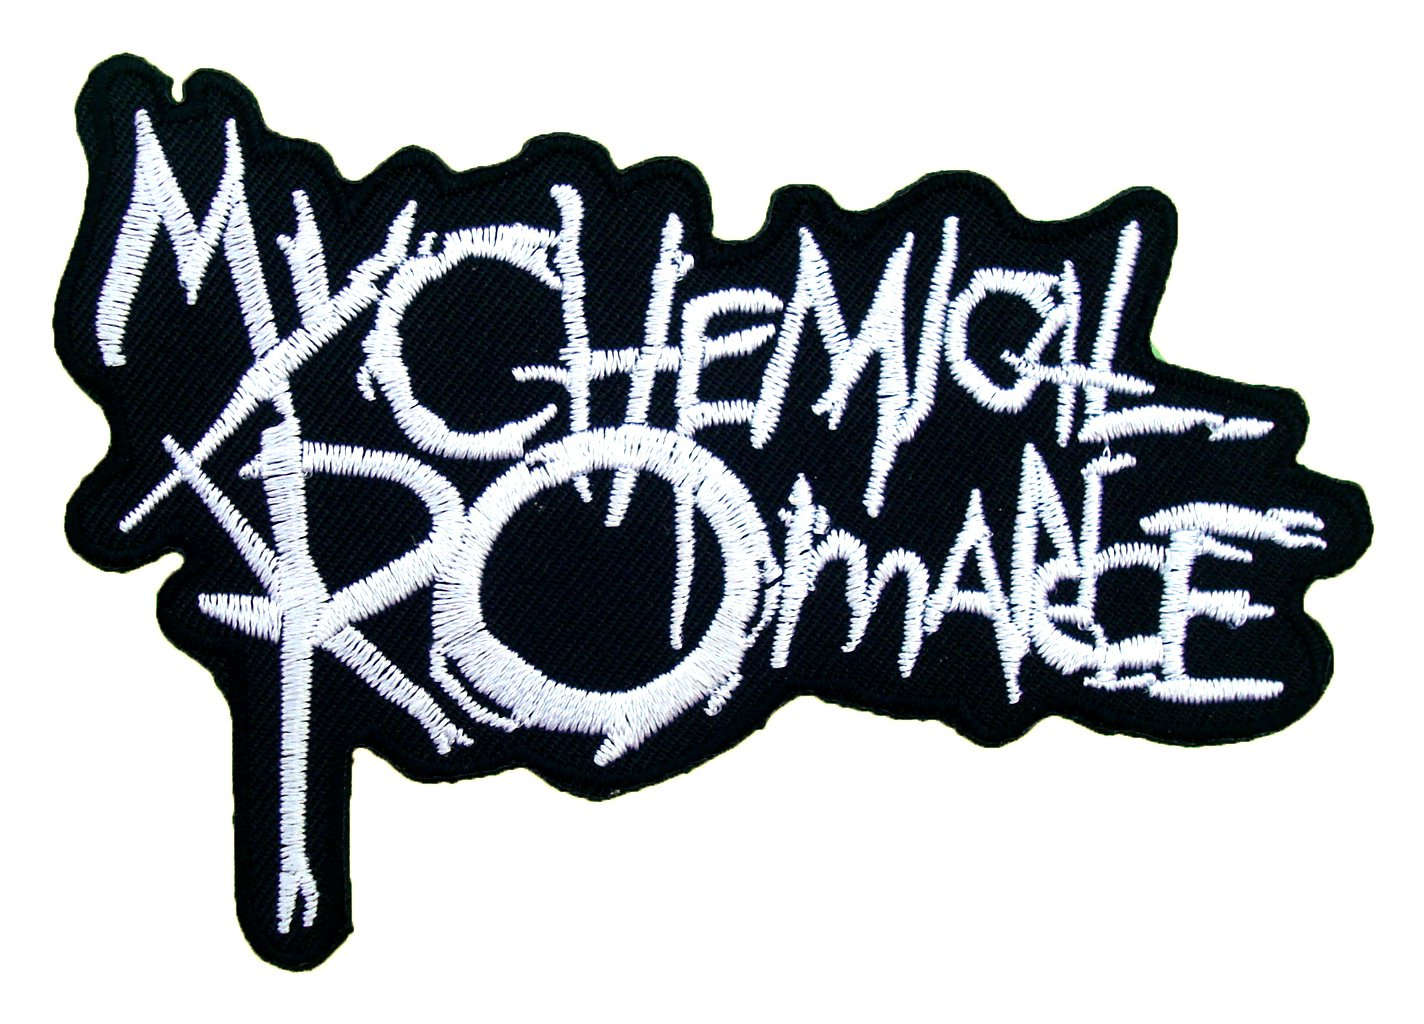 amazon com 1 x my chemical romance rock band logo t shirts mm33 rh amazon com Twenty-One Pilots Logo Blink 182 Logo